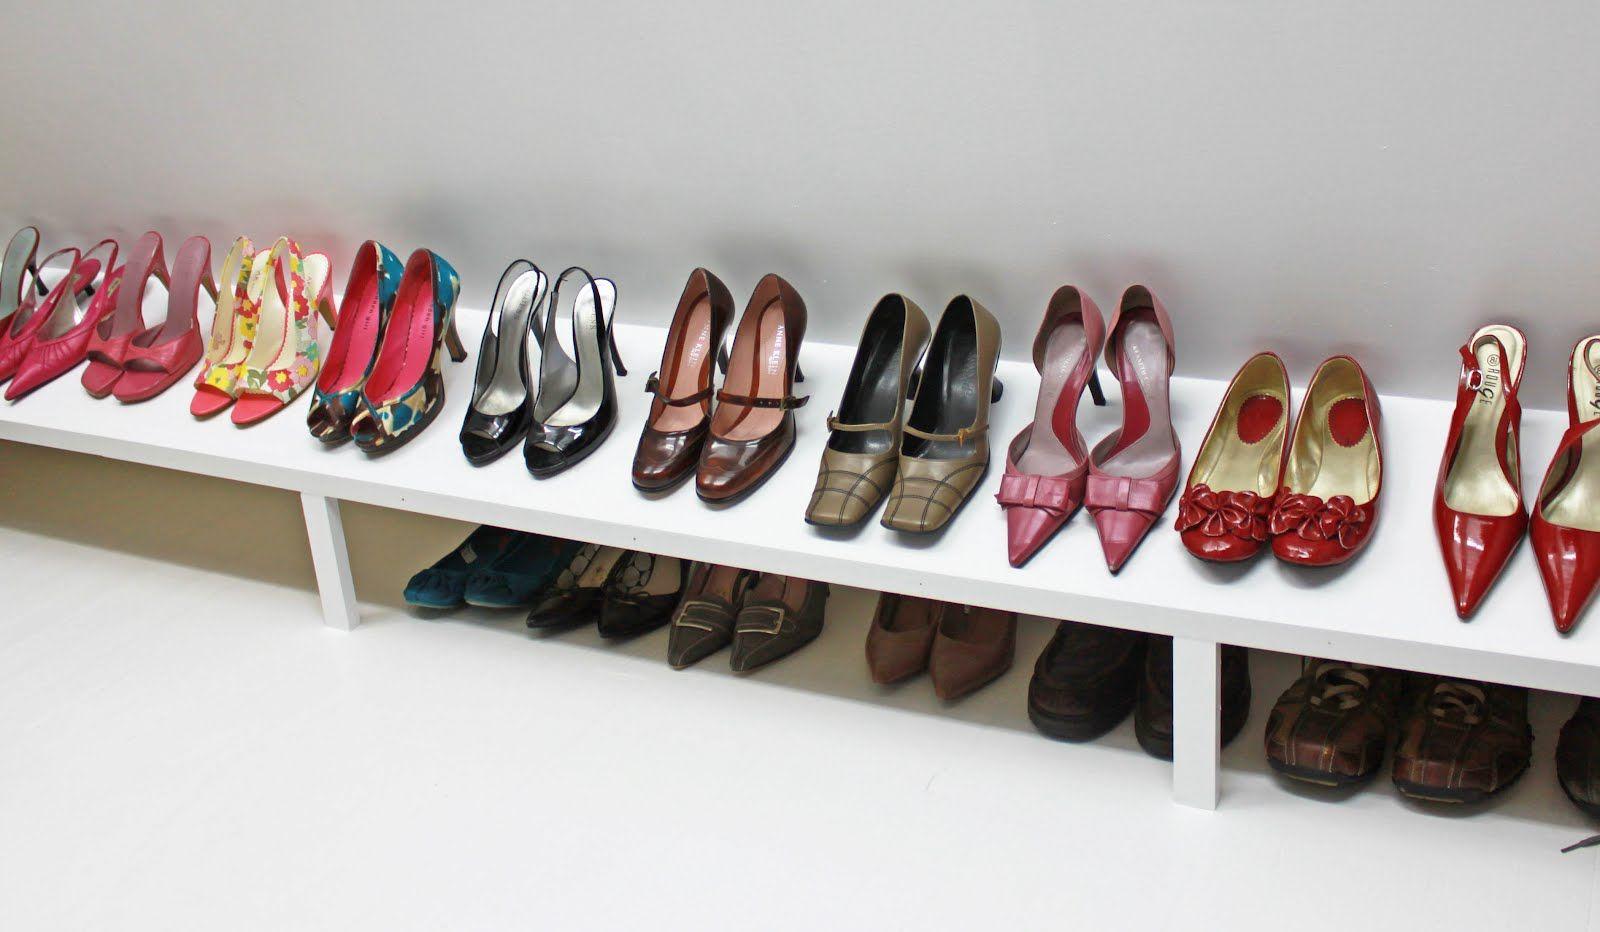 DIY: come realizzare una scarpiera